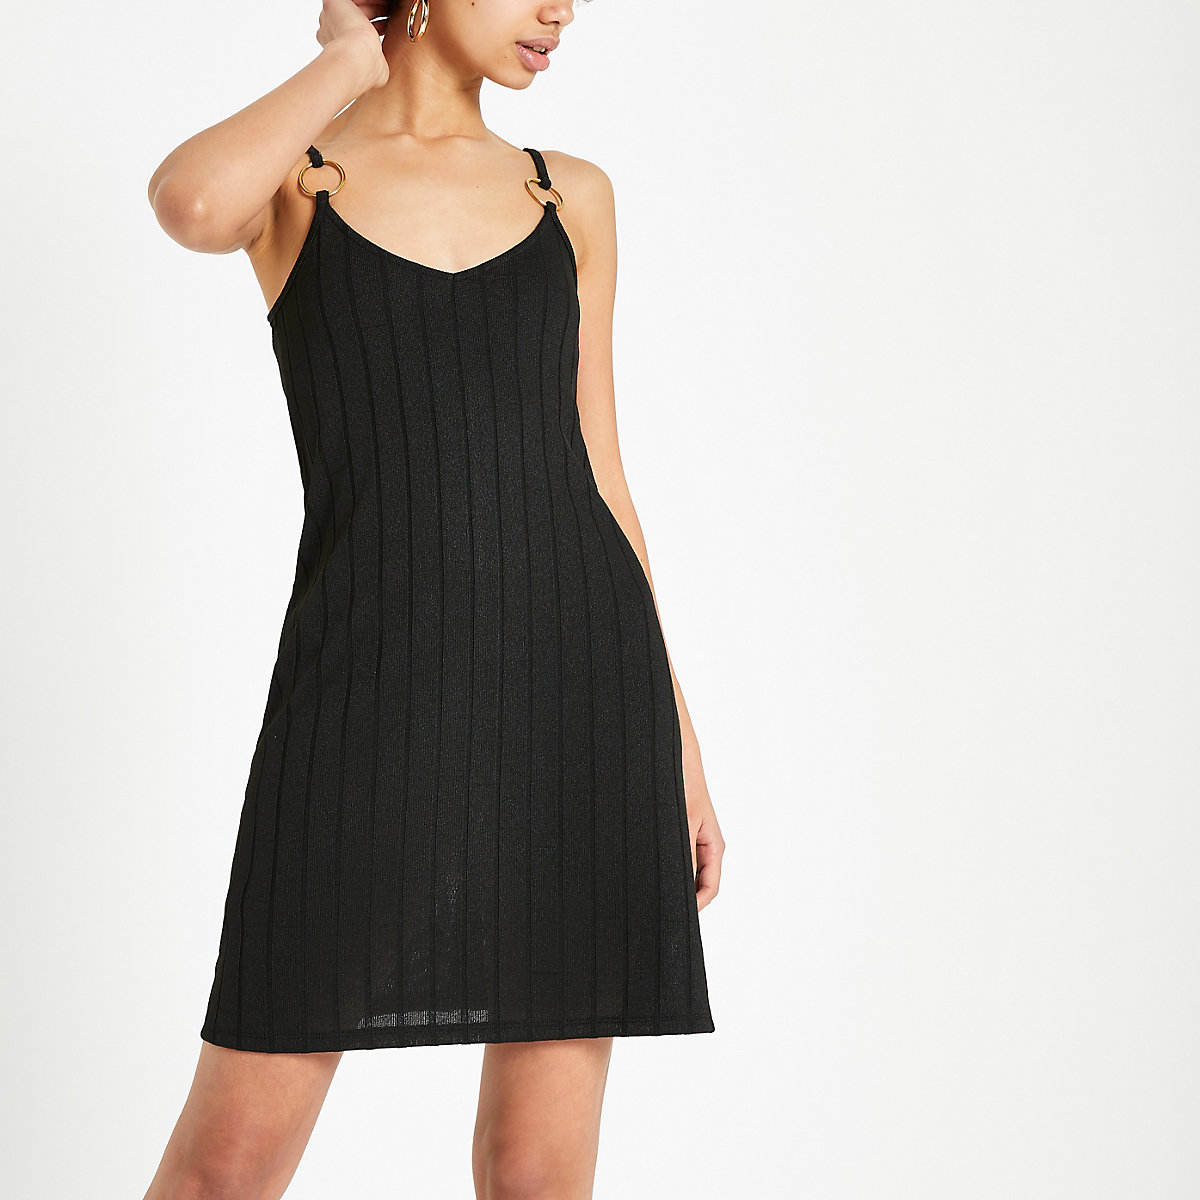 Black textured jersey swing dress